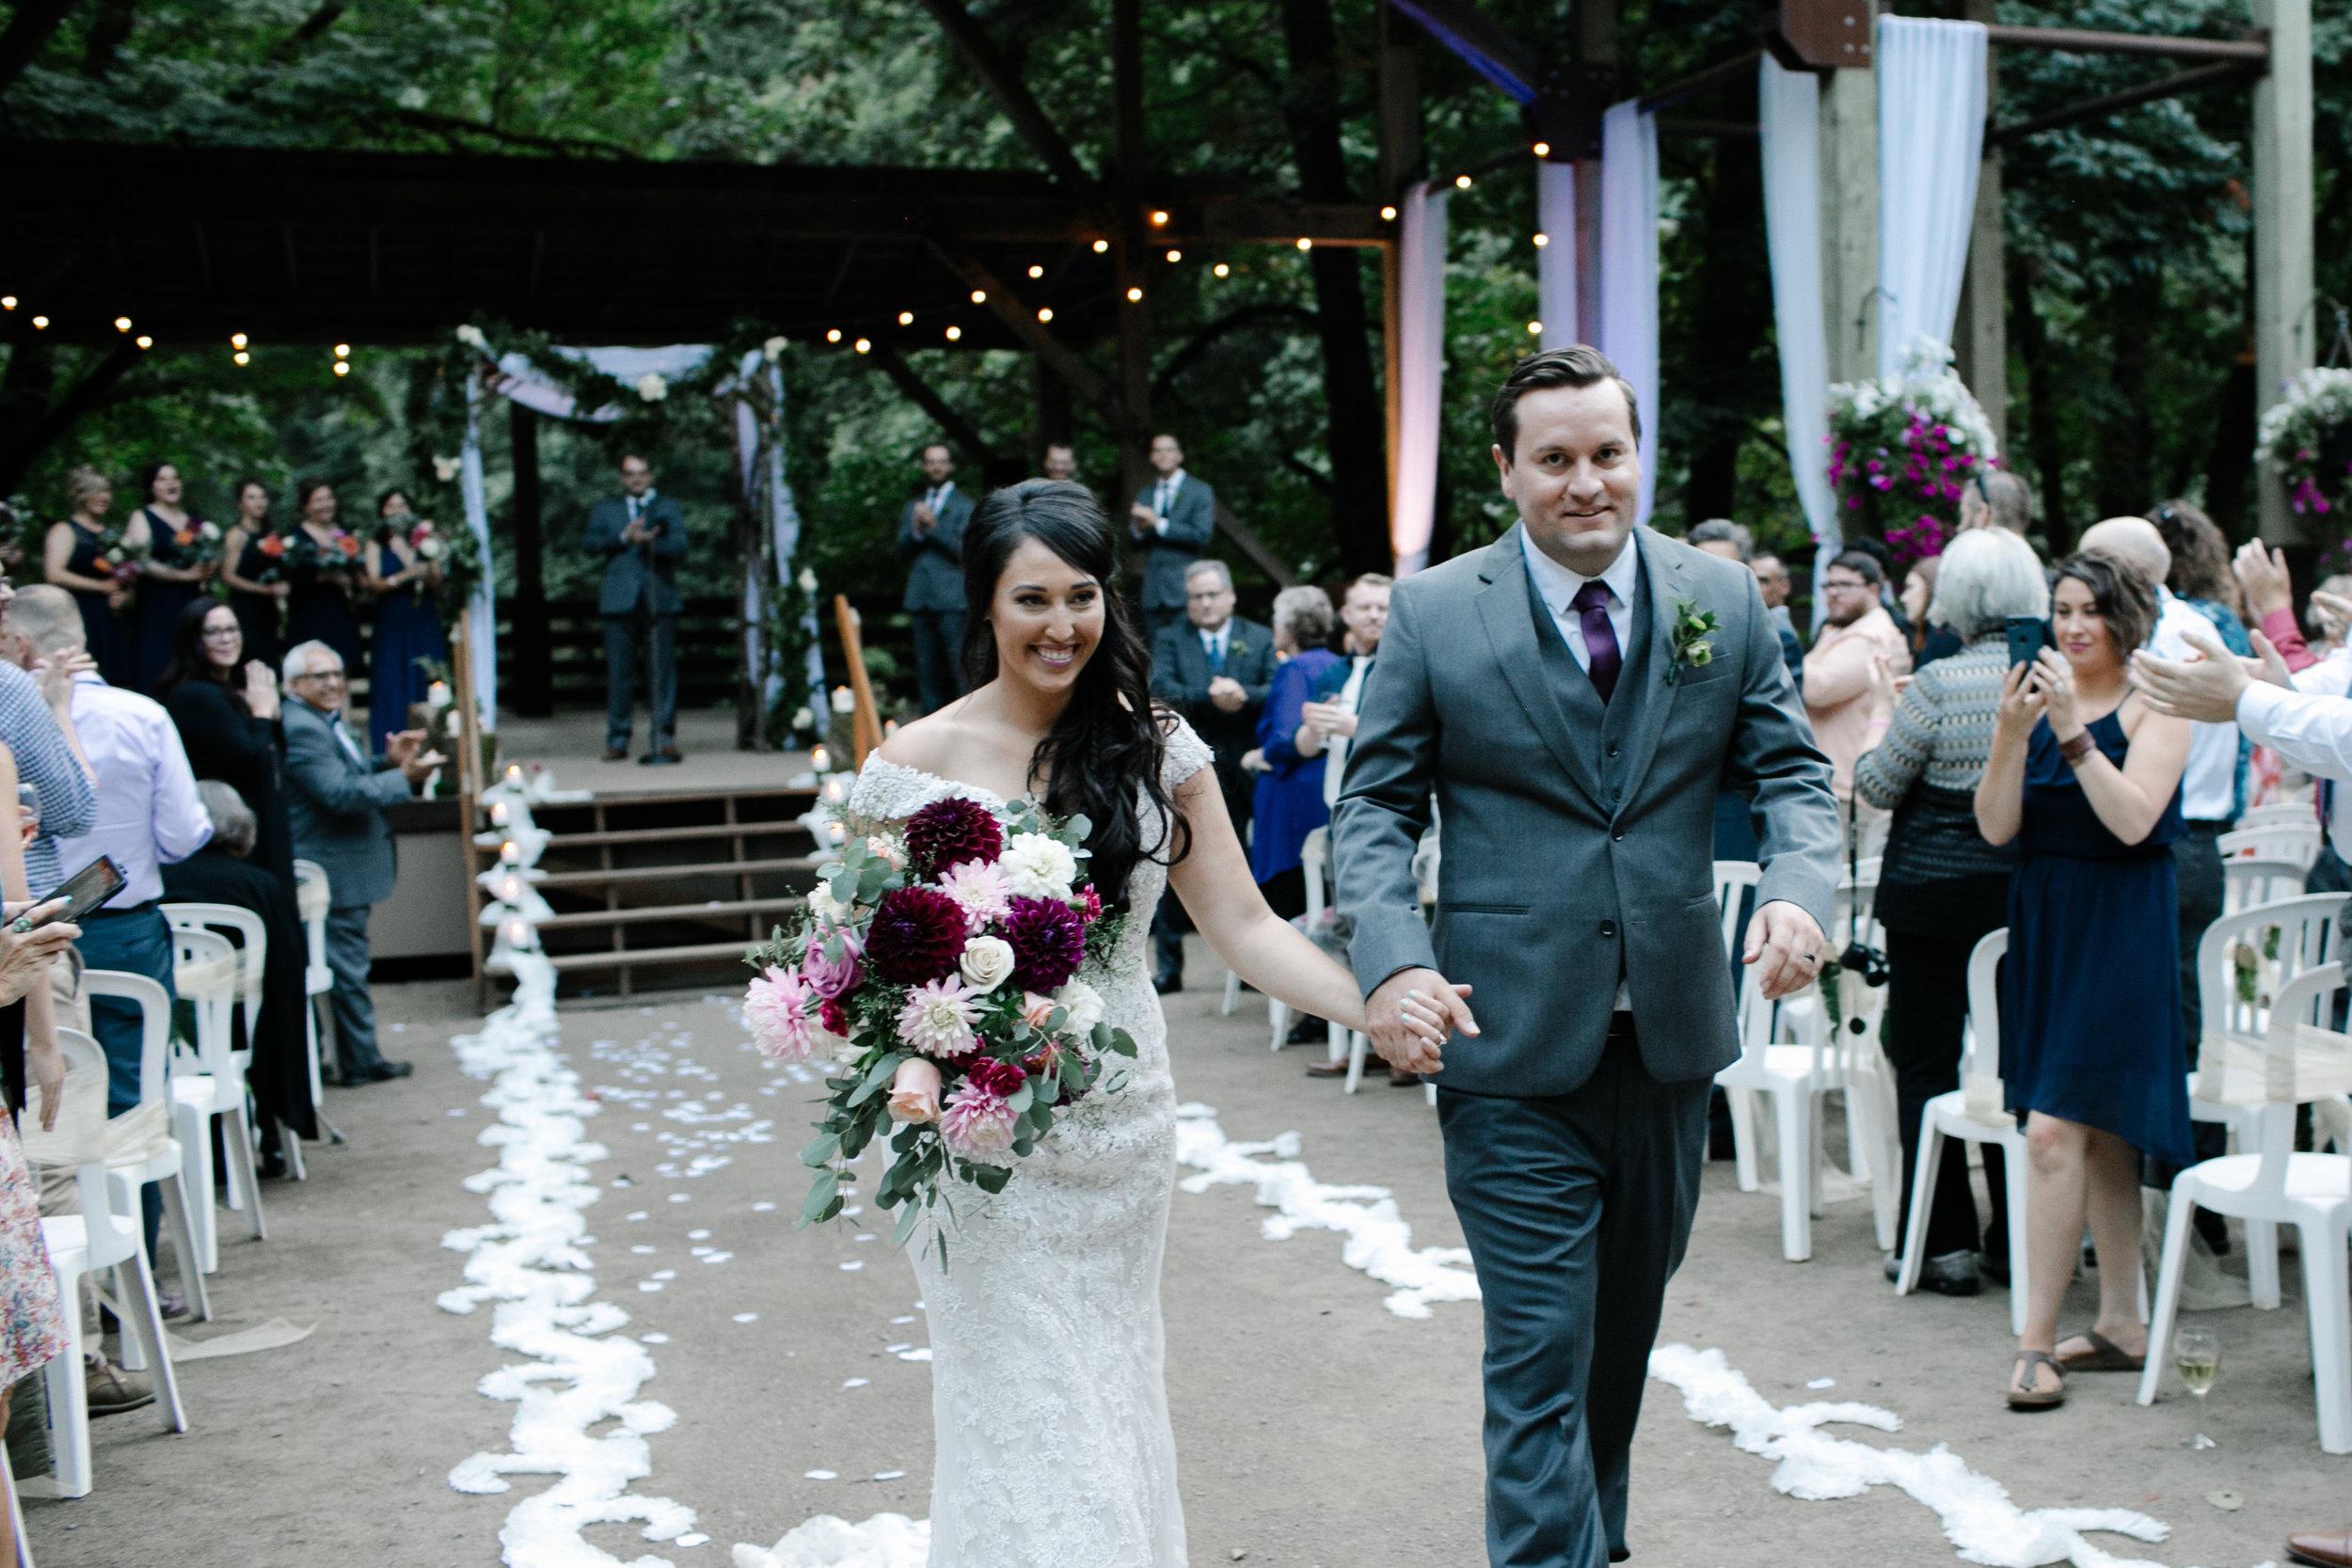 Sevlynn-Photography-Teresa-Chandler-Wedding-54.jpg